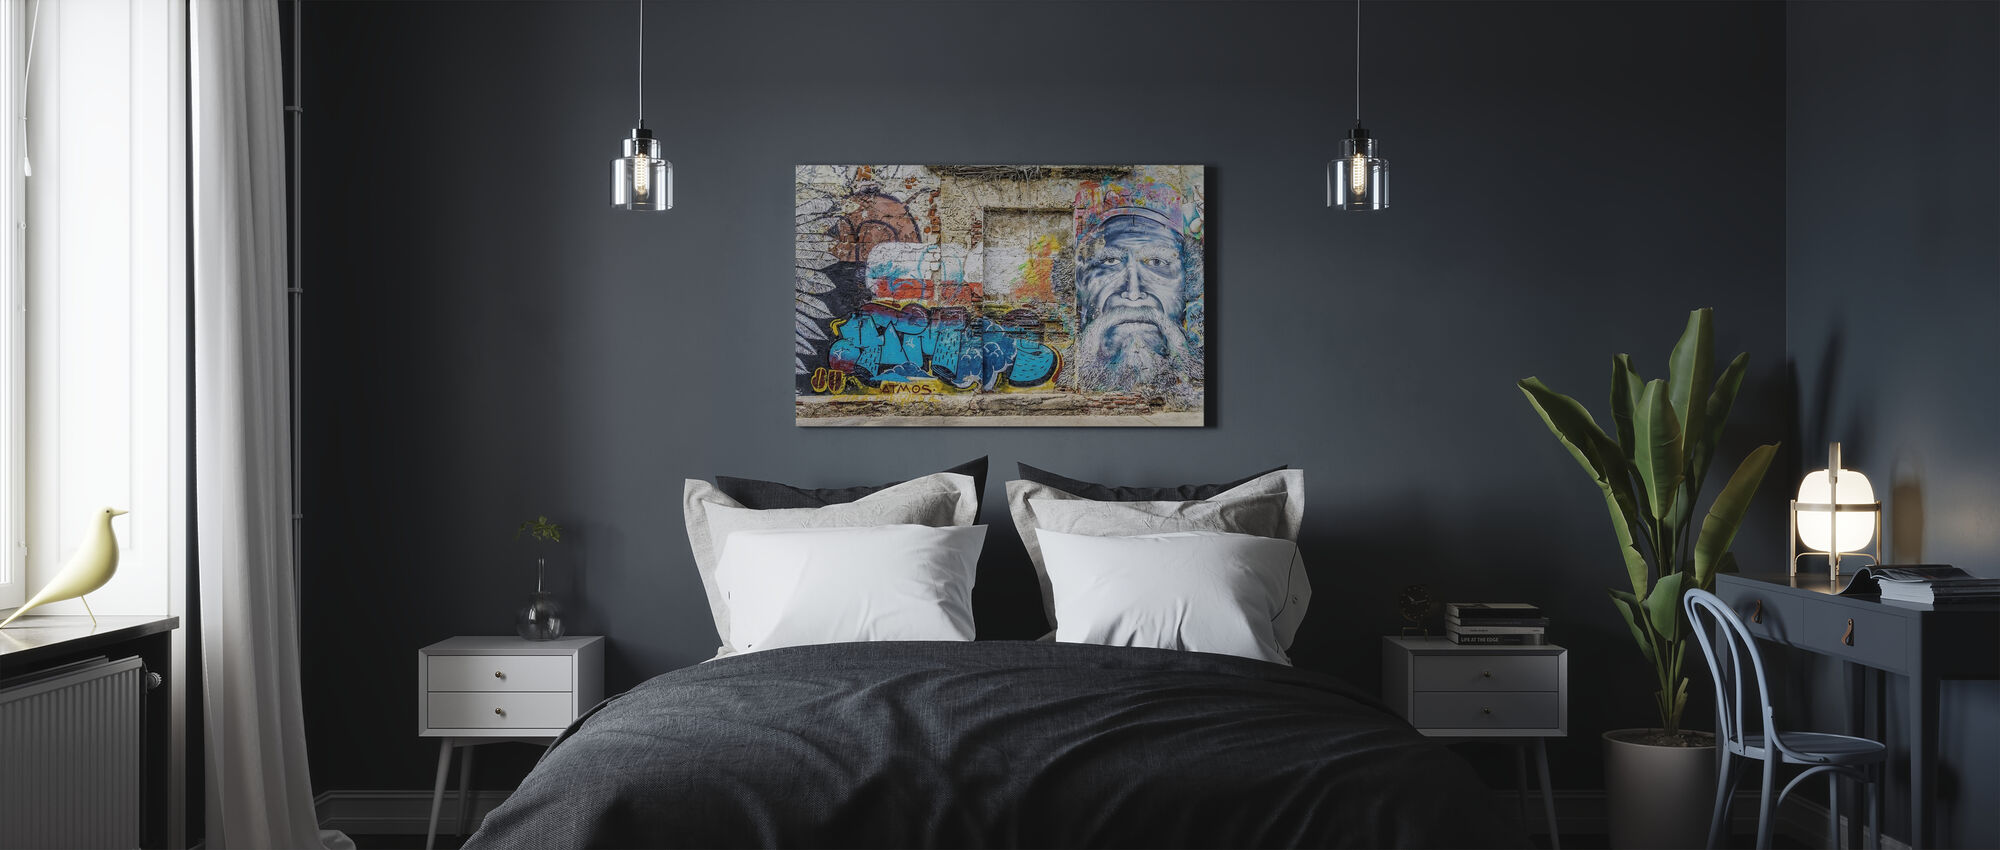 Wall Graffiti - Canvas print - Bedroom